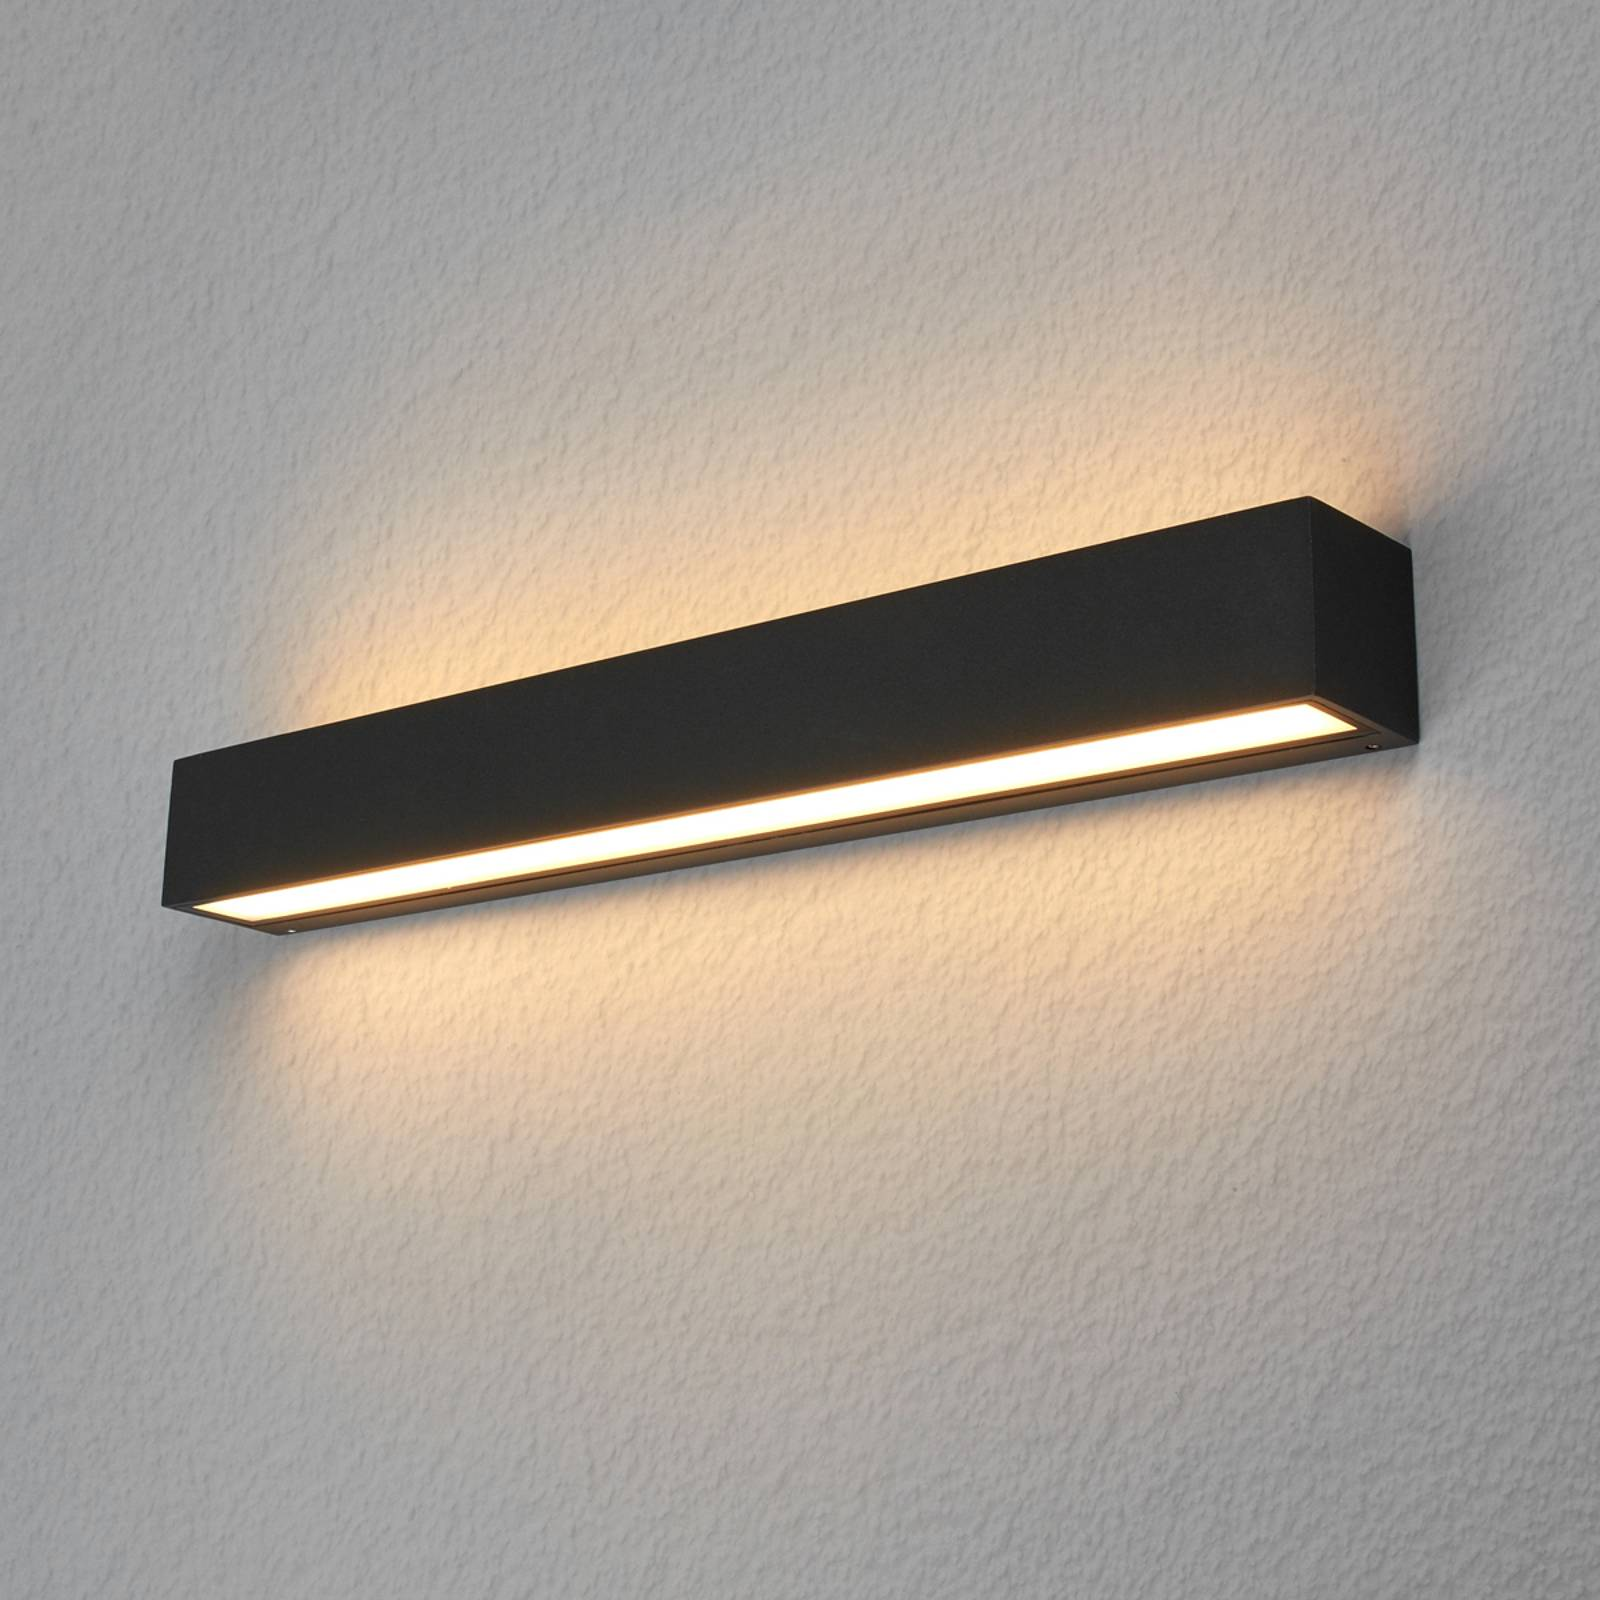 Lucande Lengo-LED-seinävalo 50cm grafiitti 2 lamp.